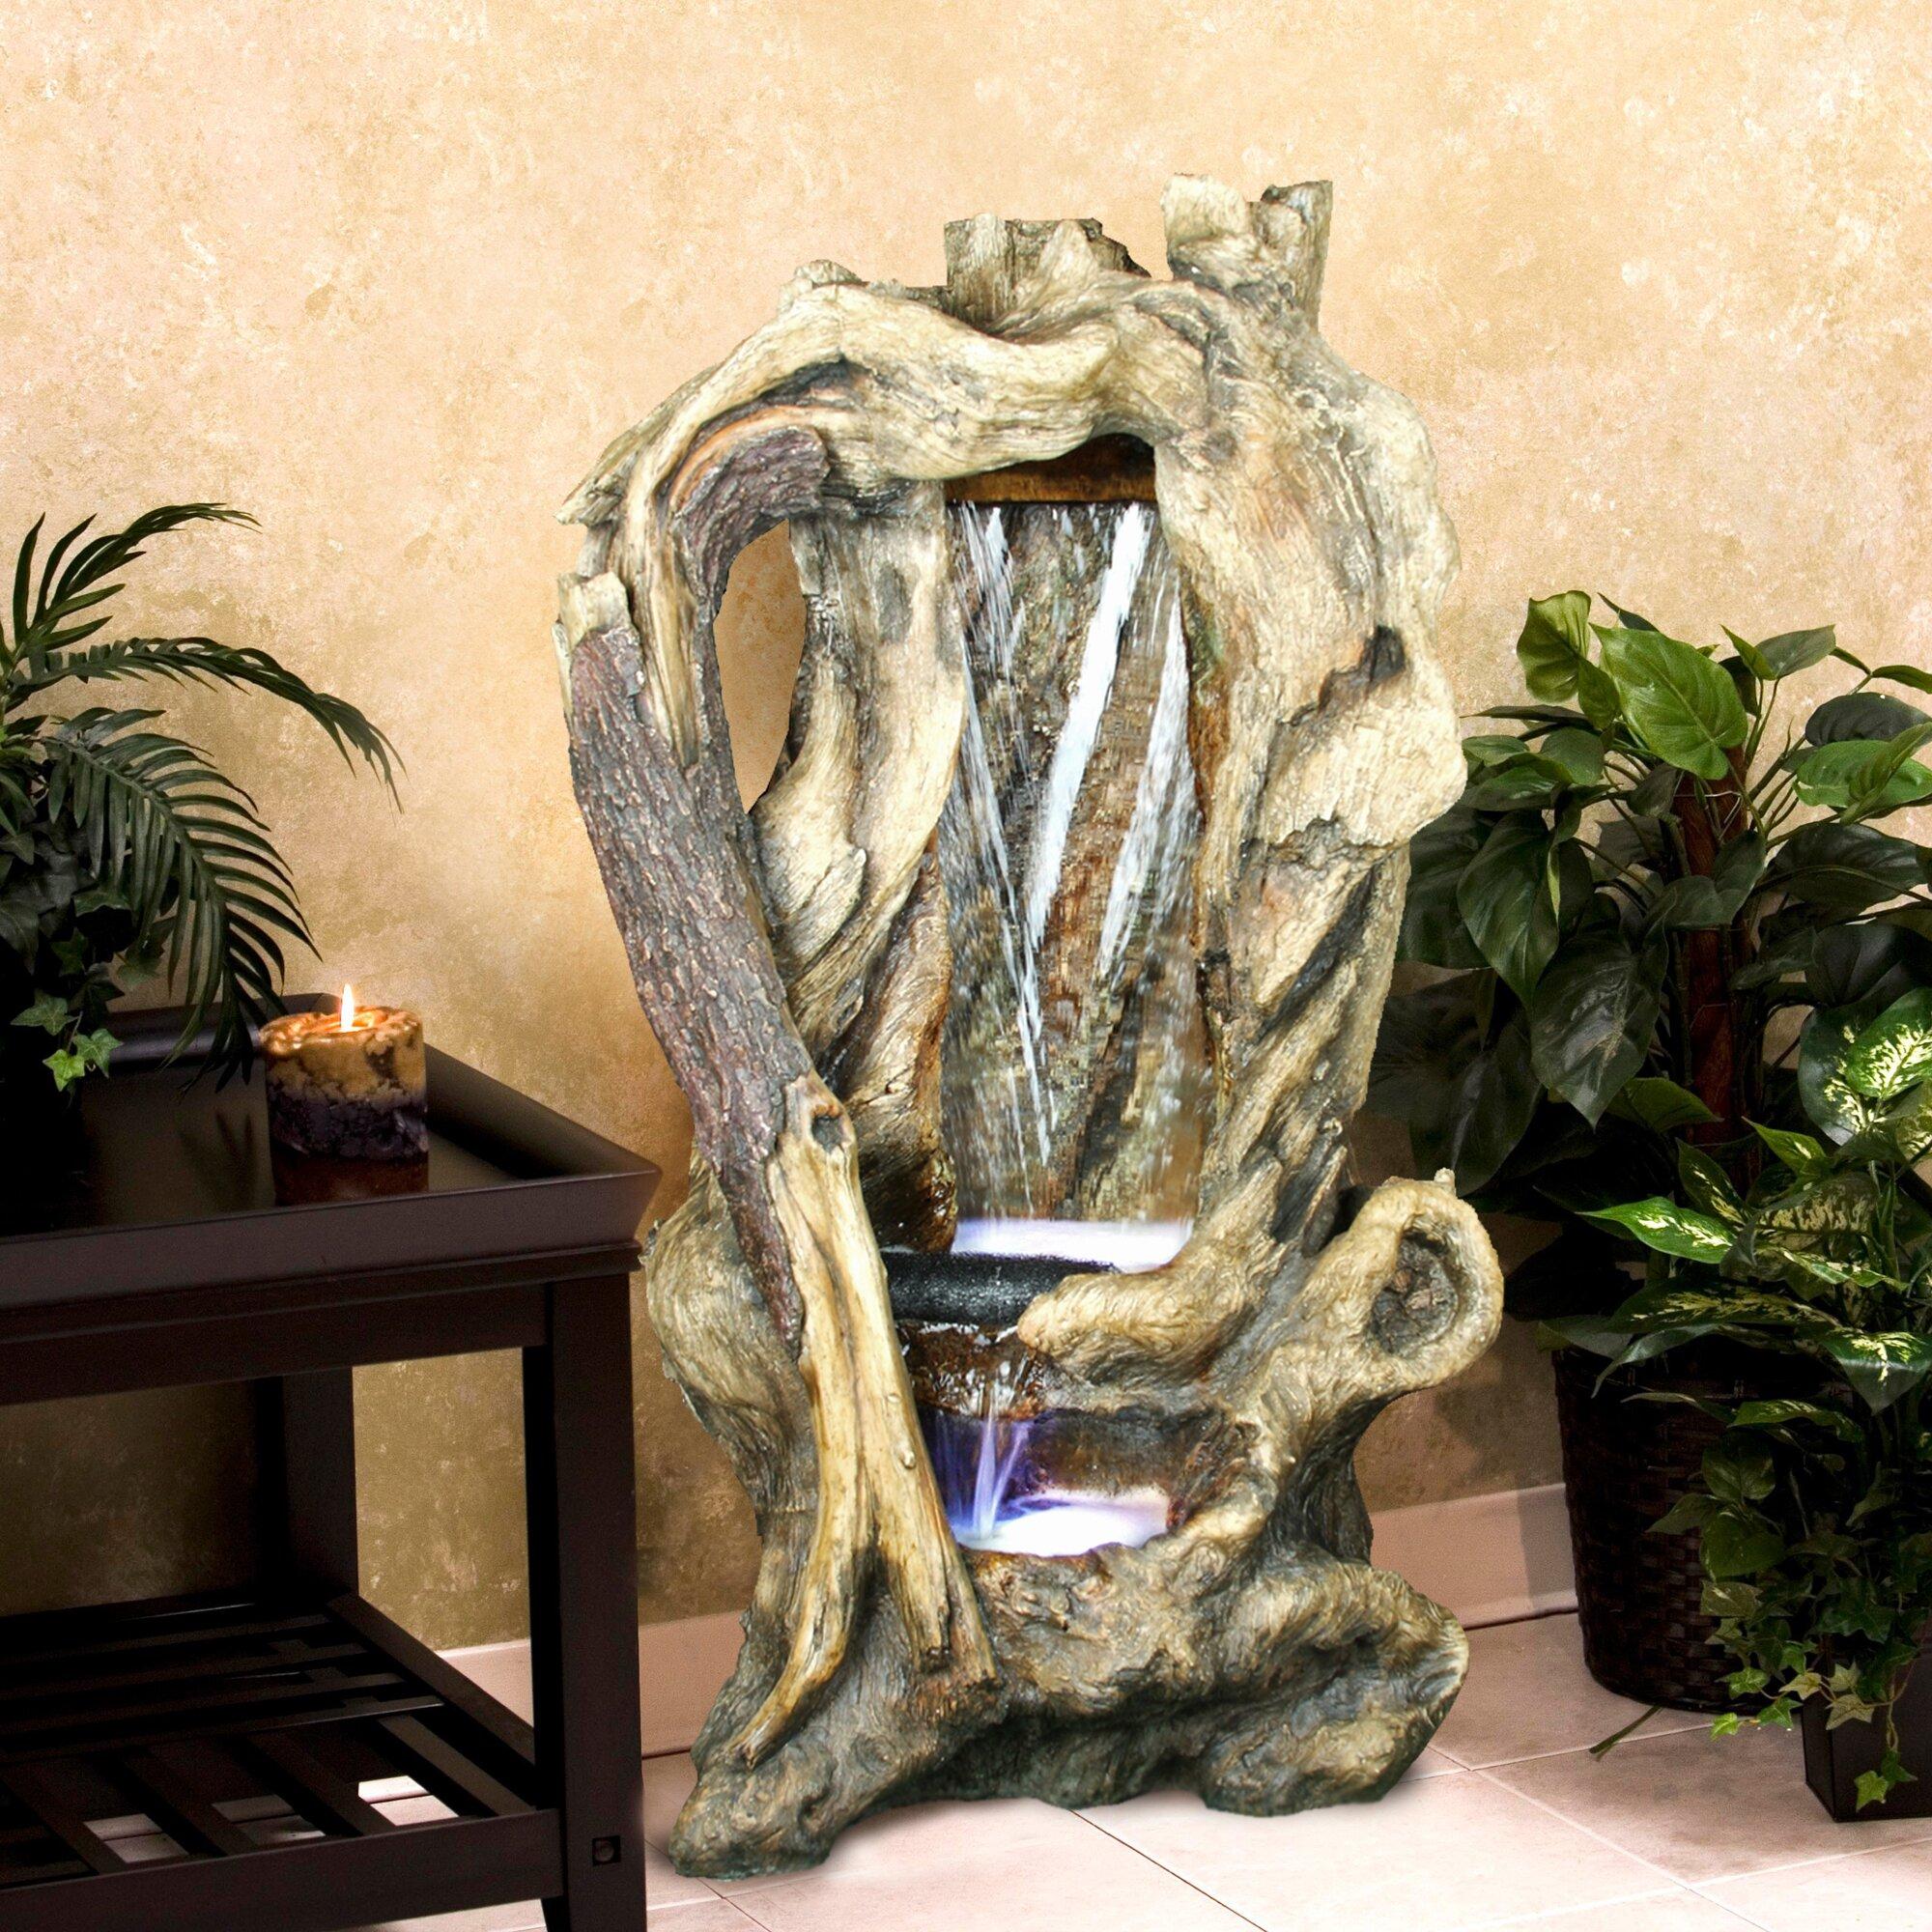 28 Yosemite Home Decor Fountains FountainsYosemite Home D